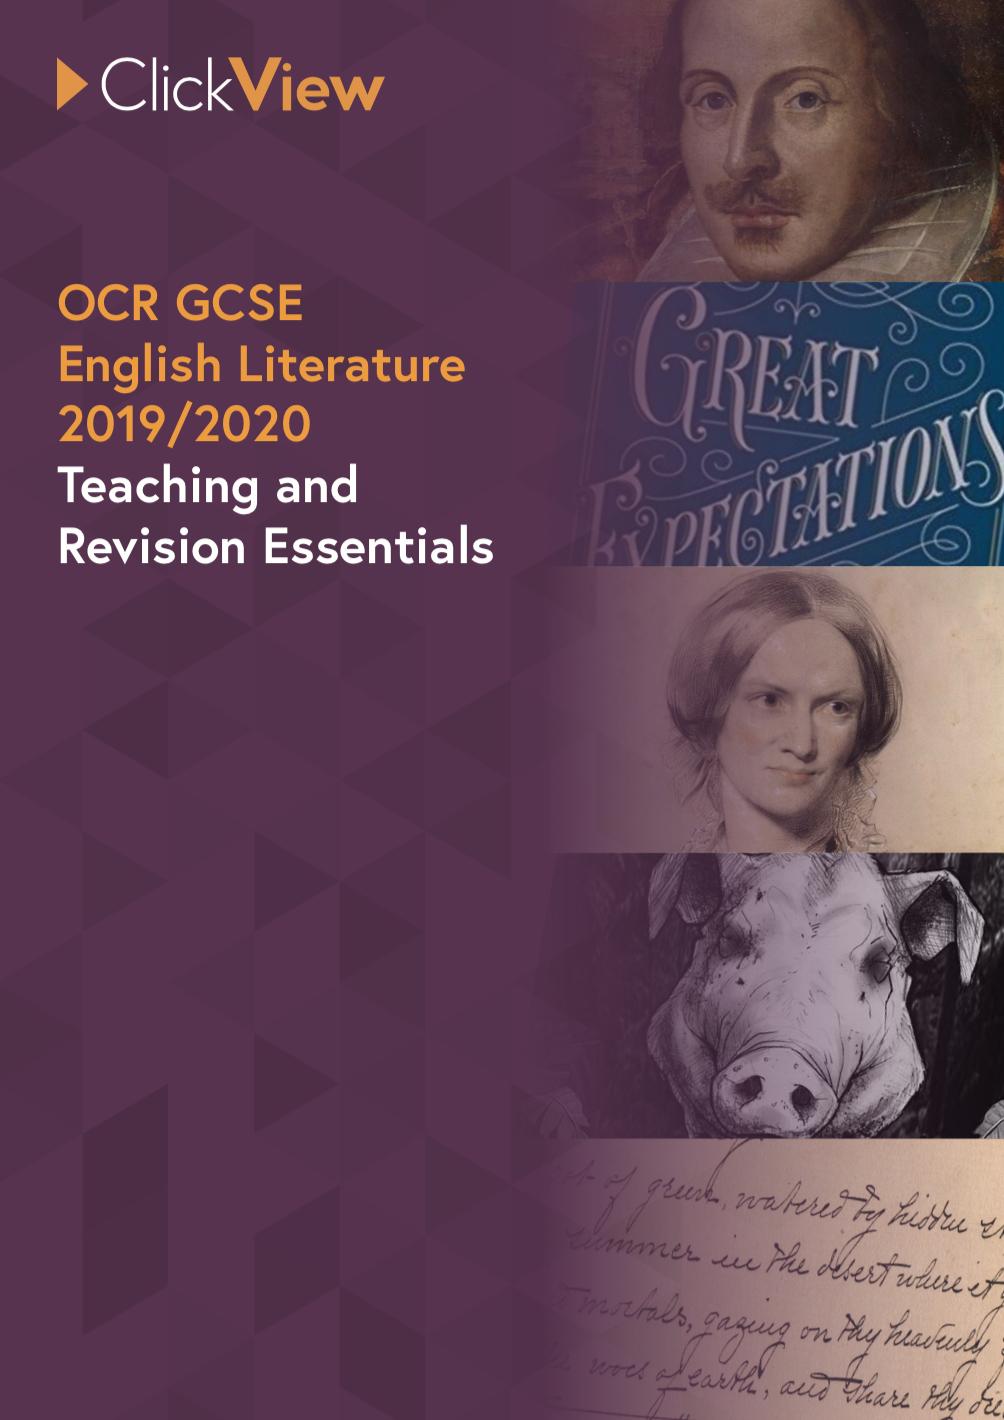 OCR GCSE English Literature - Teaching and Revision Essentials